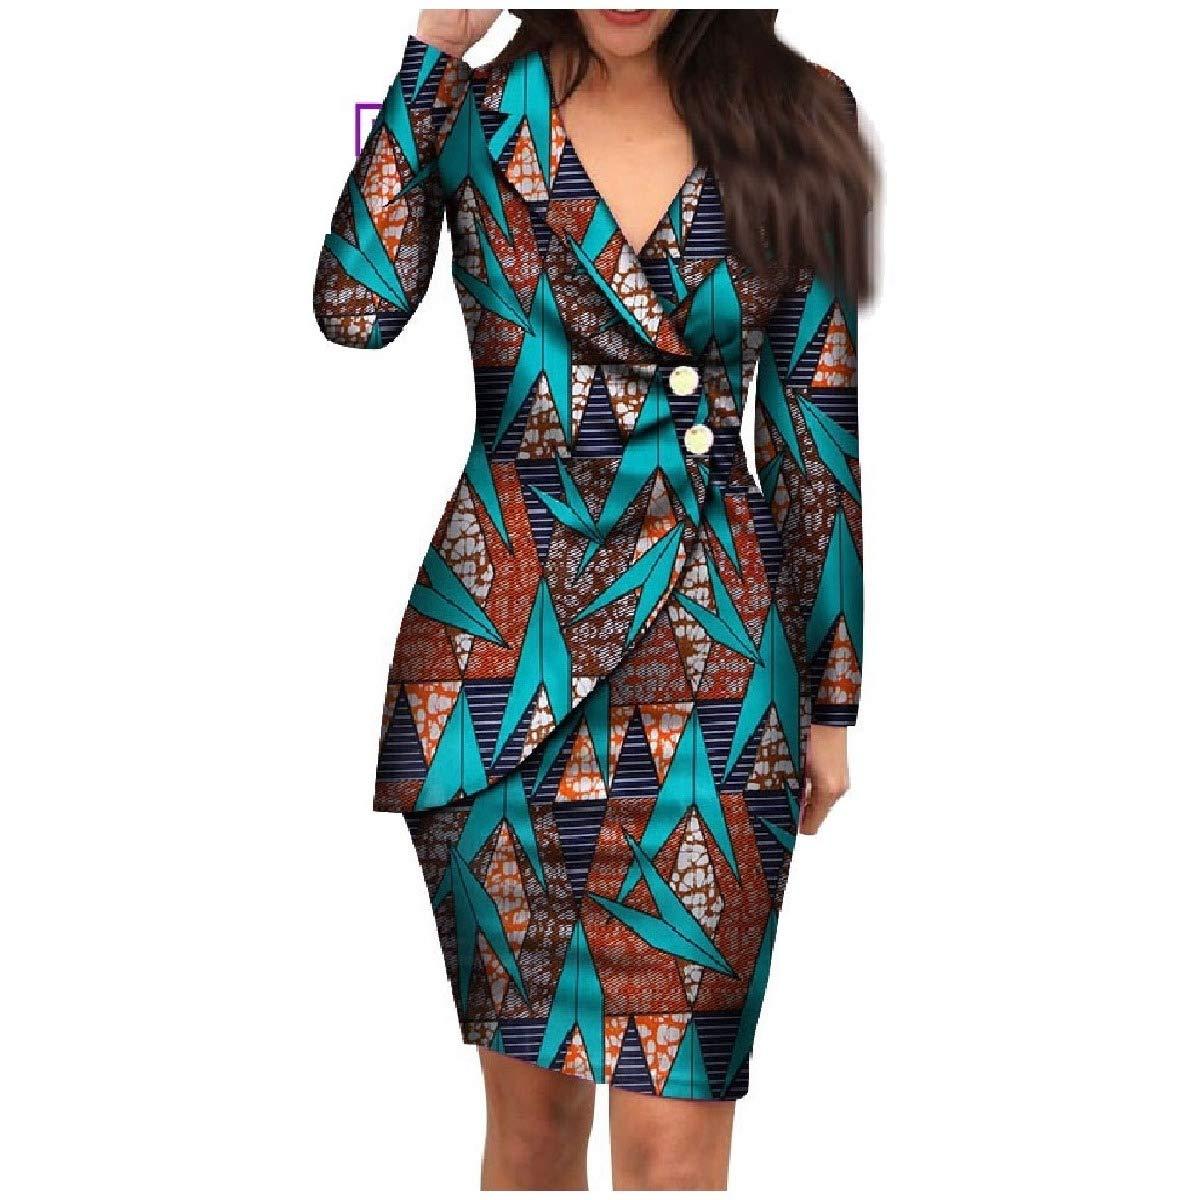 Lake bluee HEFASDM Women's Dashiki Elegent Blazer African Printed Premium Back Cotton Dress